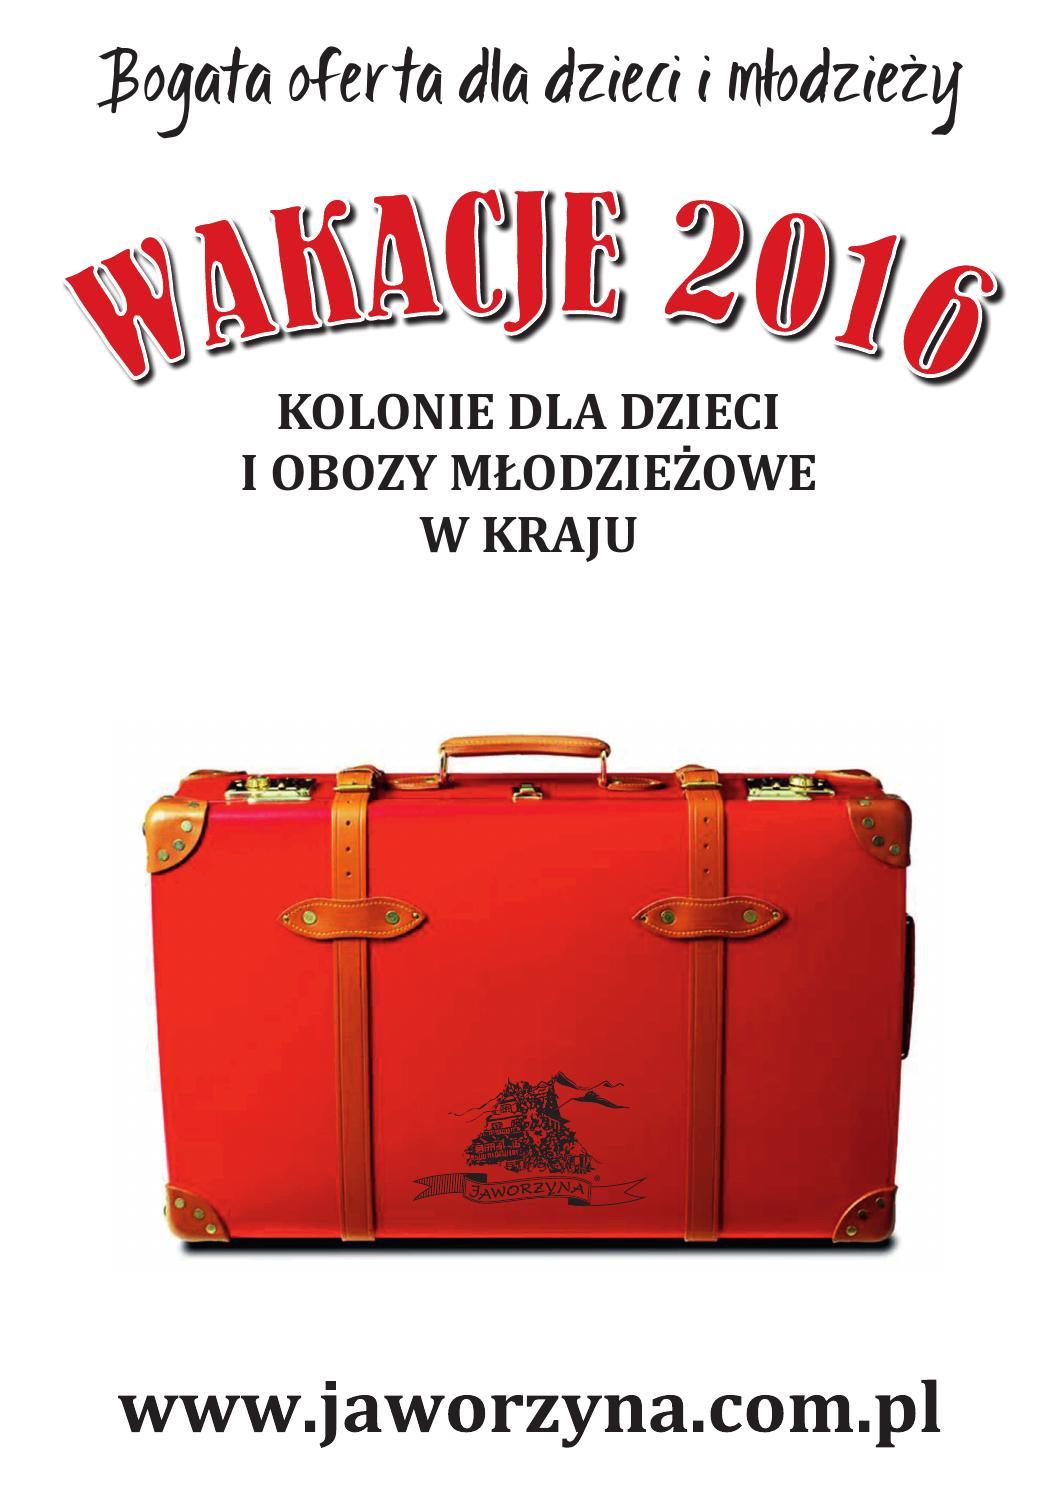 Brunetki Zakopane - Darmowe ogoszenia gfxevolution.com